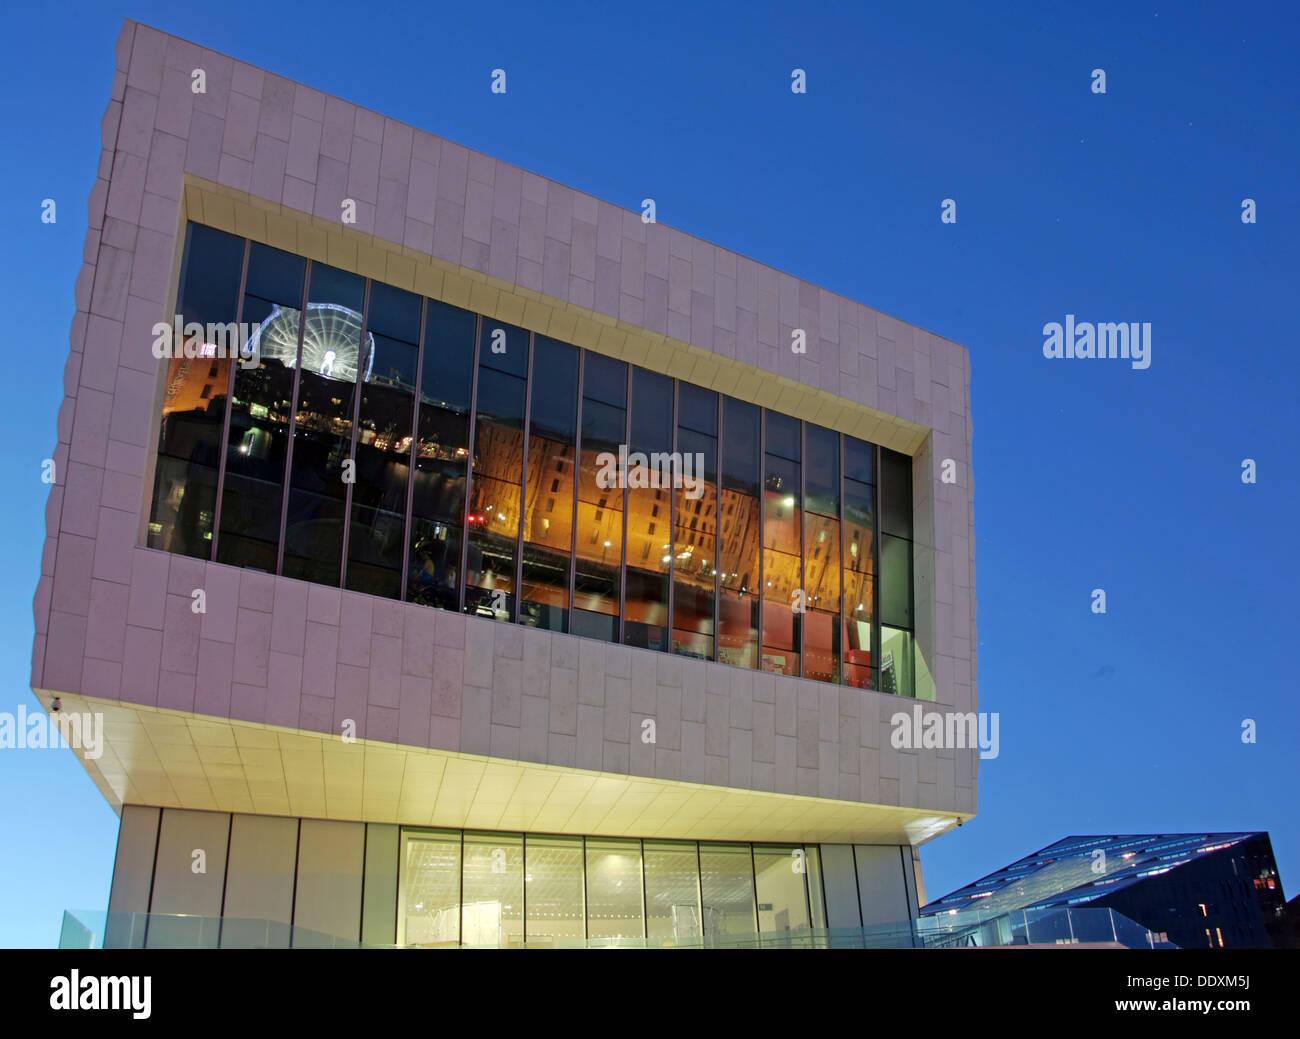 Albert Dock reflected in new museum at Nighttime liverpool Merseyside England UK - Stock Image